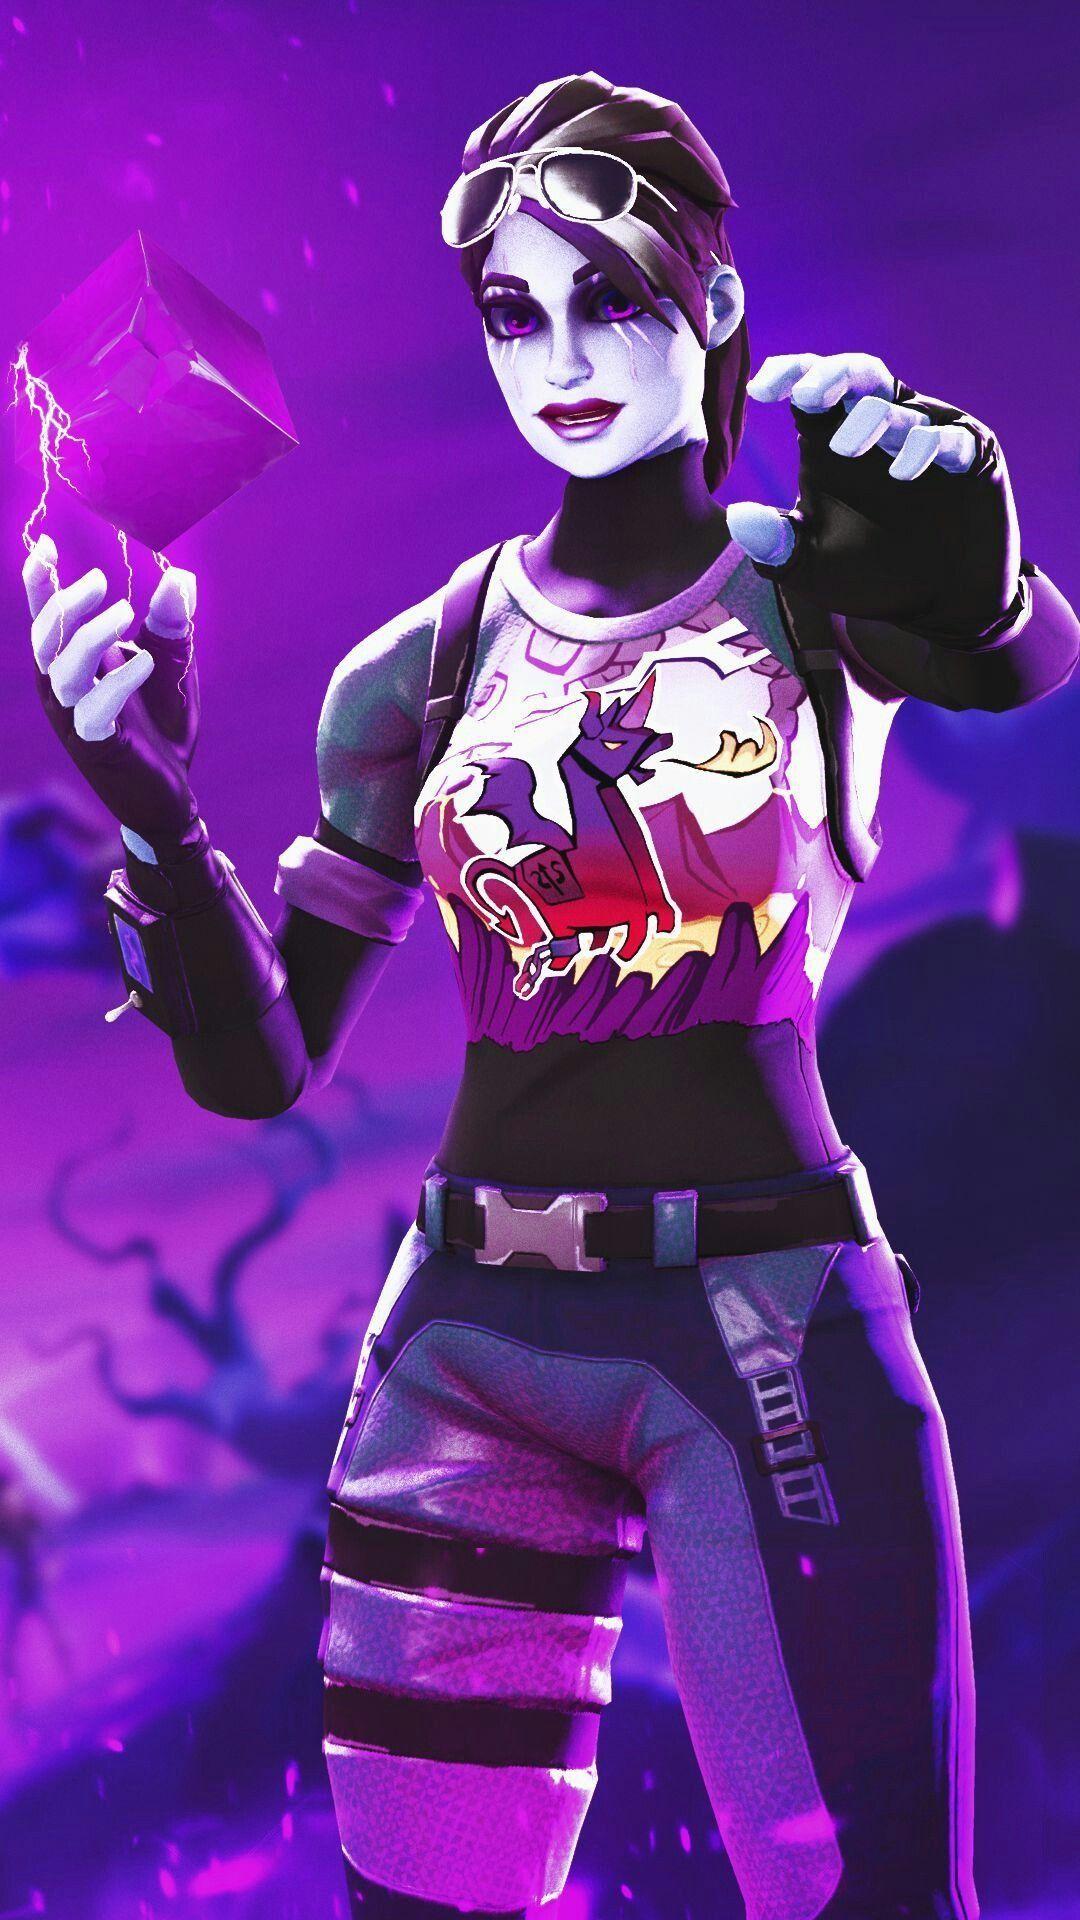 Dark Bomber Fortnite Skin Wallpaper in 2020 Best gaming 1080x1920